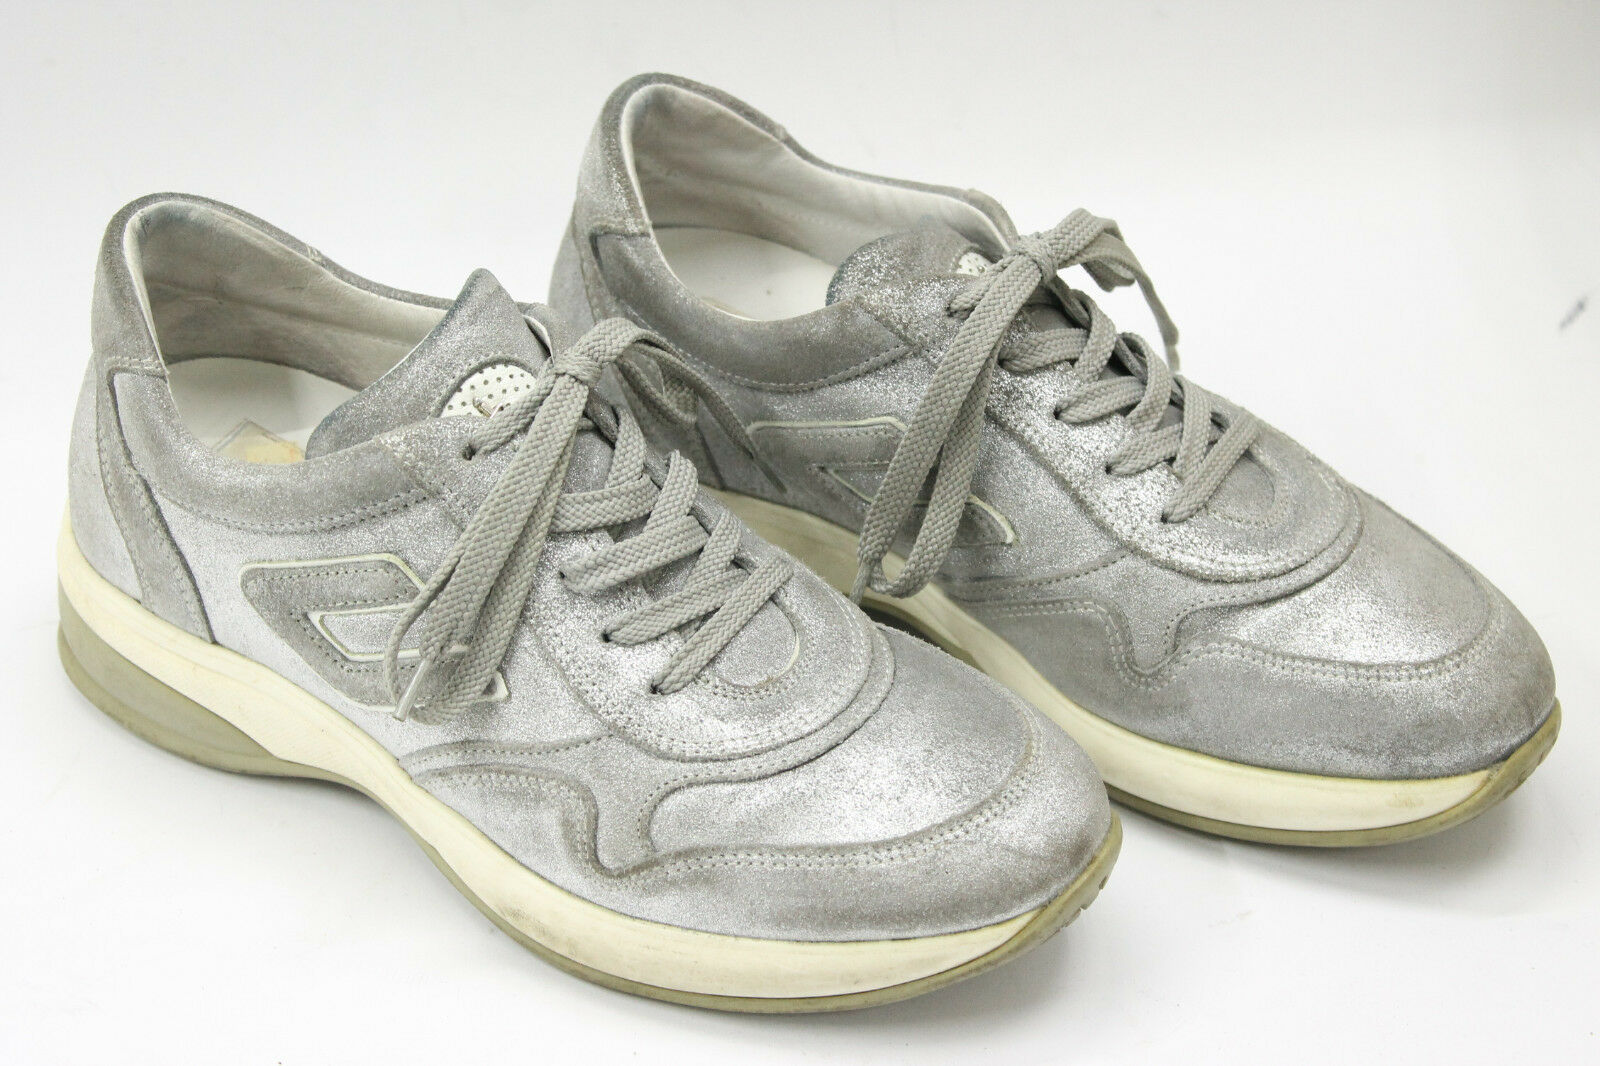 4 US CESARE PACIOTTI femmes chaussures  sz 5 Europe 35  gris  suede leather S6922